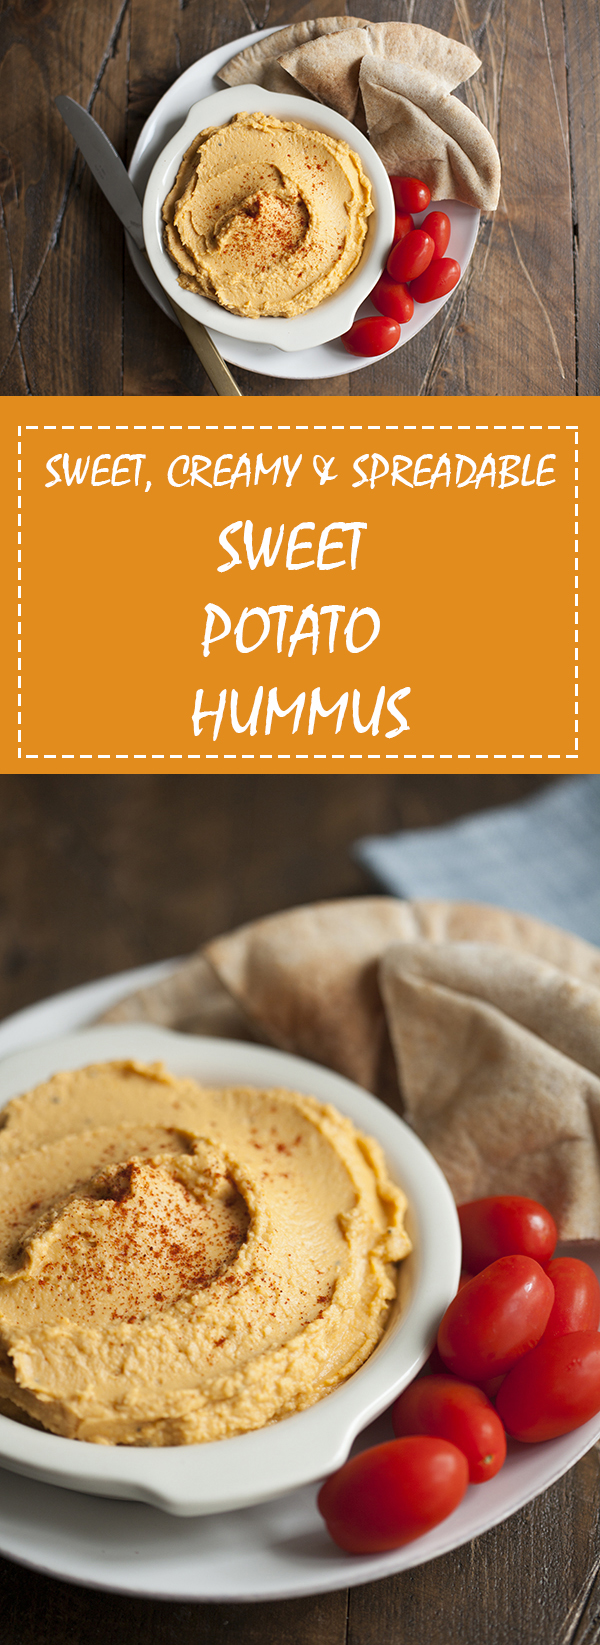 Creamy, dreamy, spreadable sweet potato hummus | Vegan and crowd-pleasing! |The Full Helping